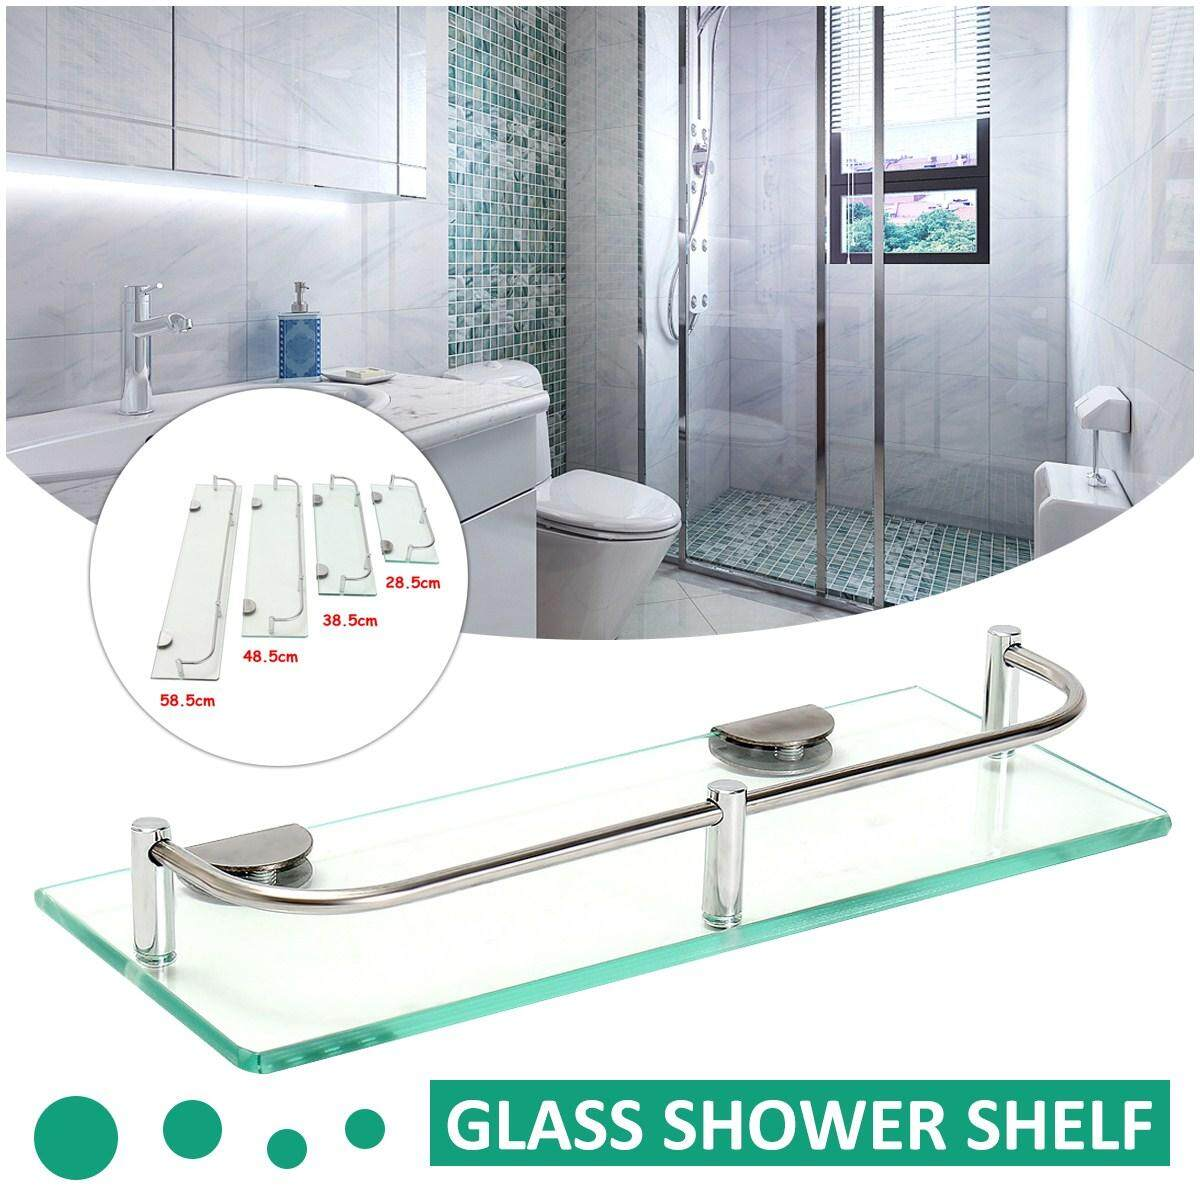 Product details of Modern Glass Corner Holder Rectangle Shelf Wall Mounted Bathroom Shower Storage [28.5cm]